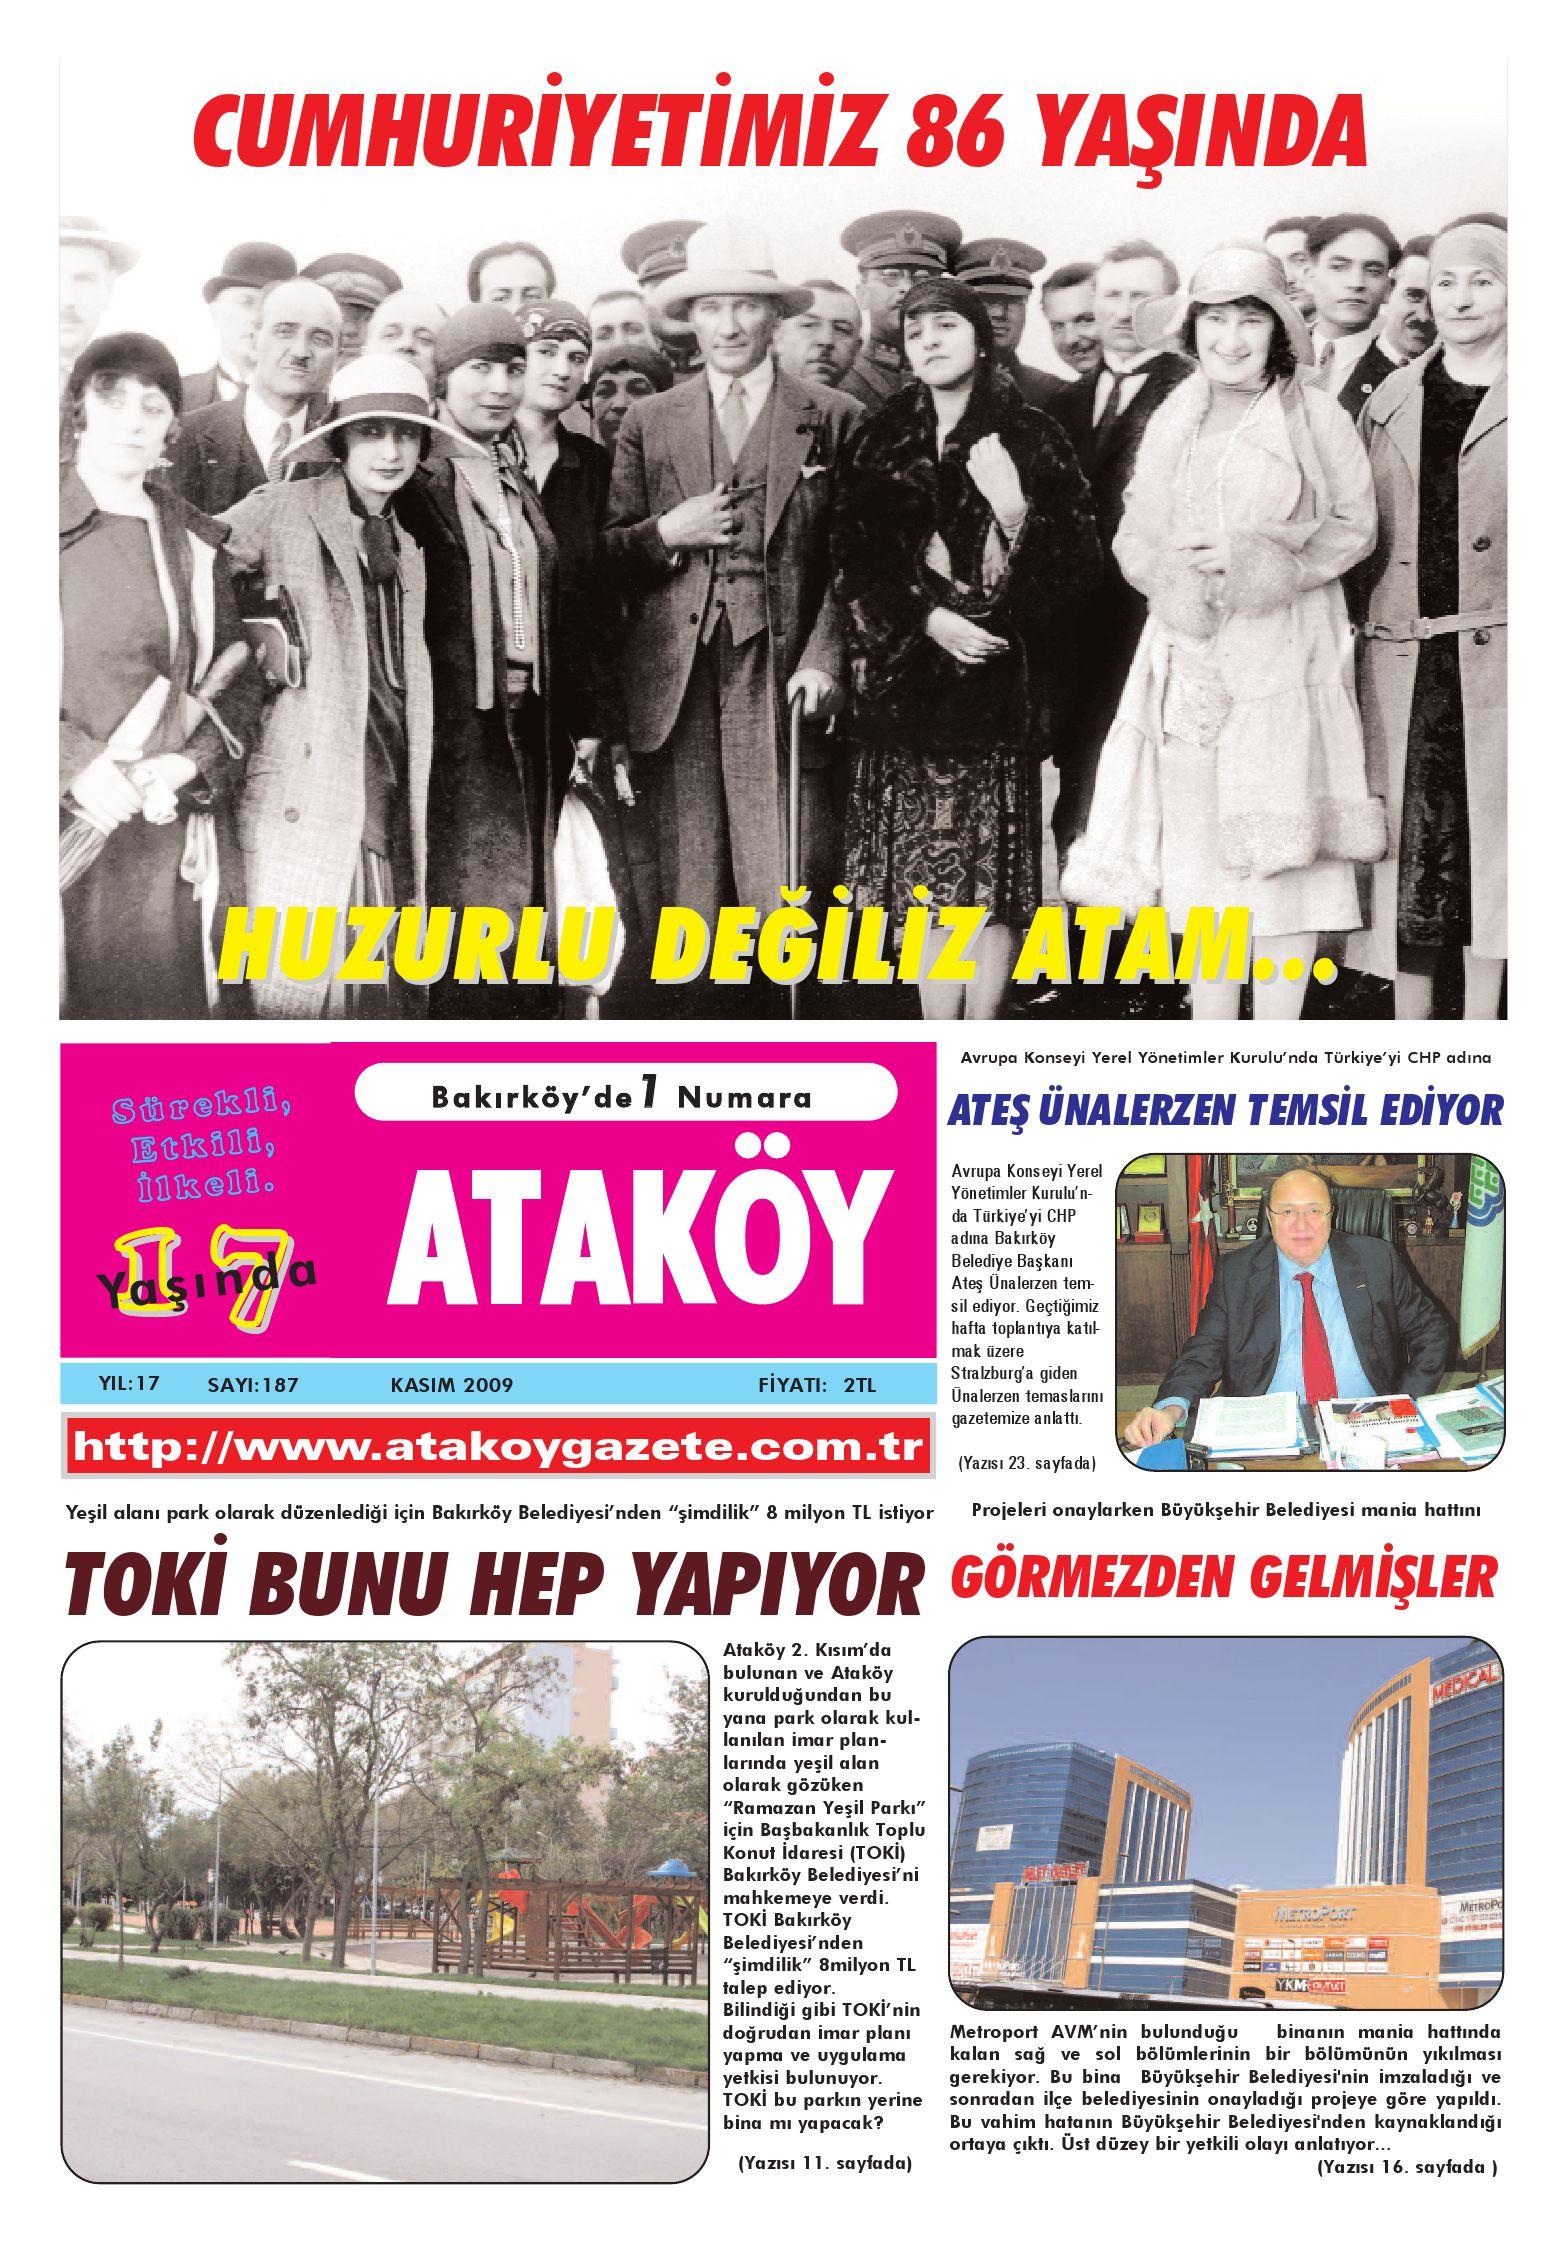 Atakoy Gazete Kasim 2009 By Gokhan Atamer Issuu